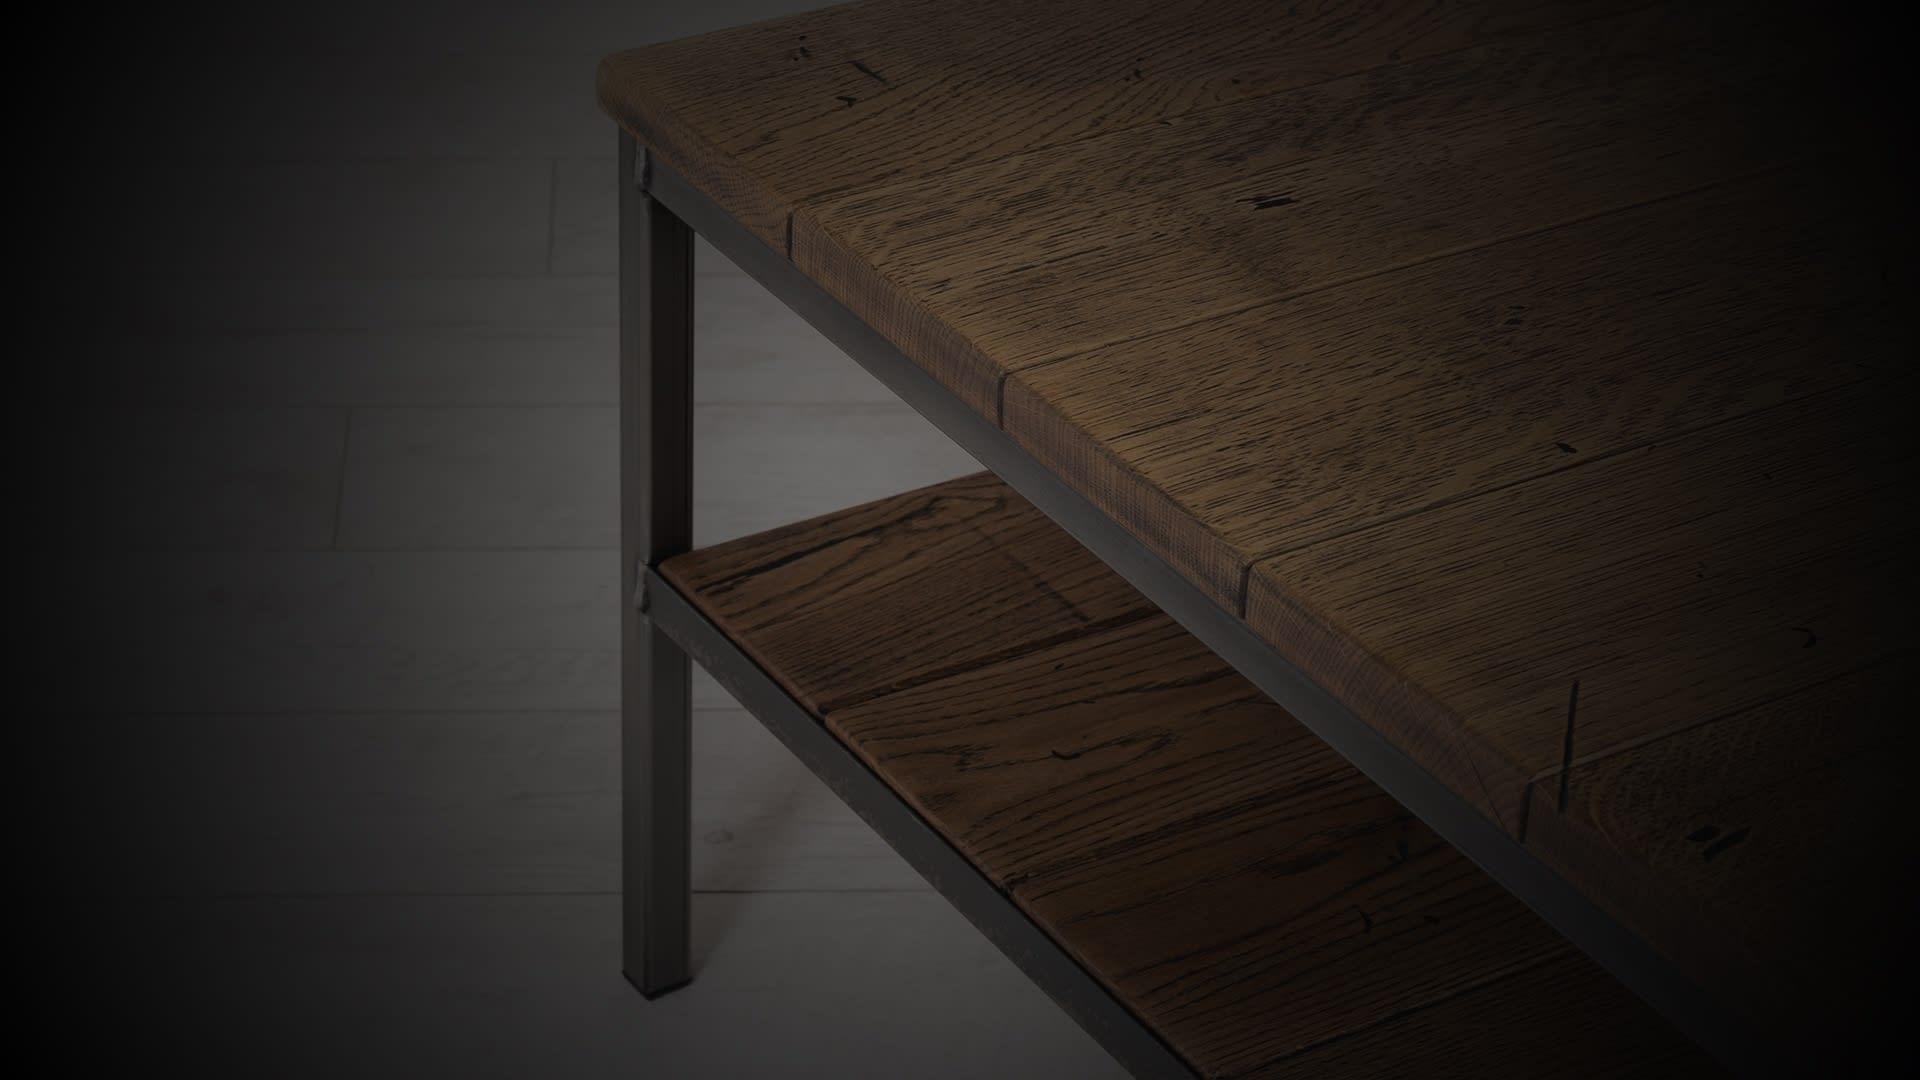 SV warehouse coffee table darkened